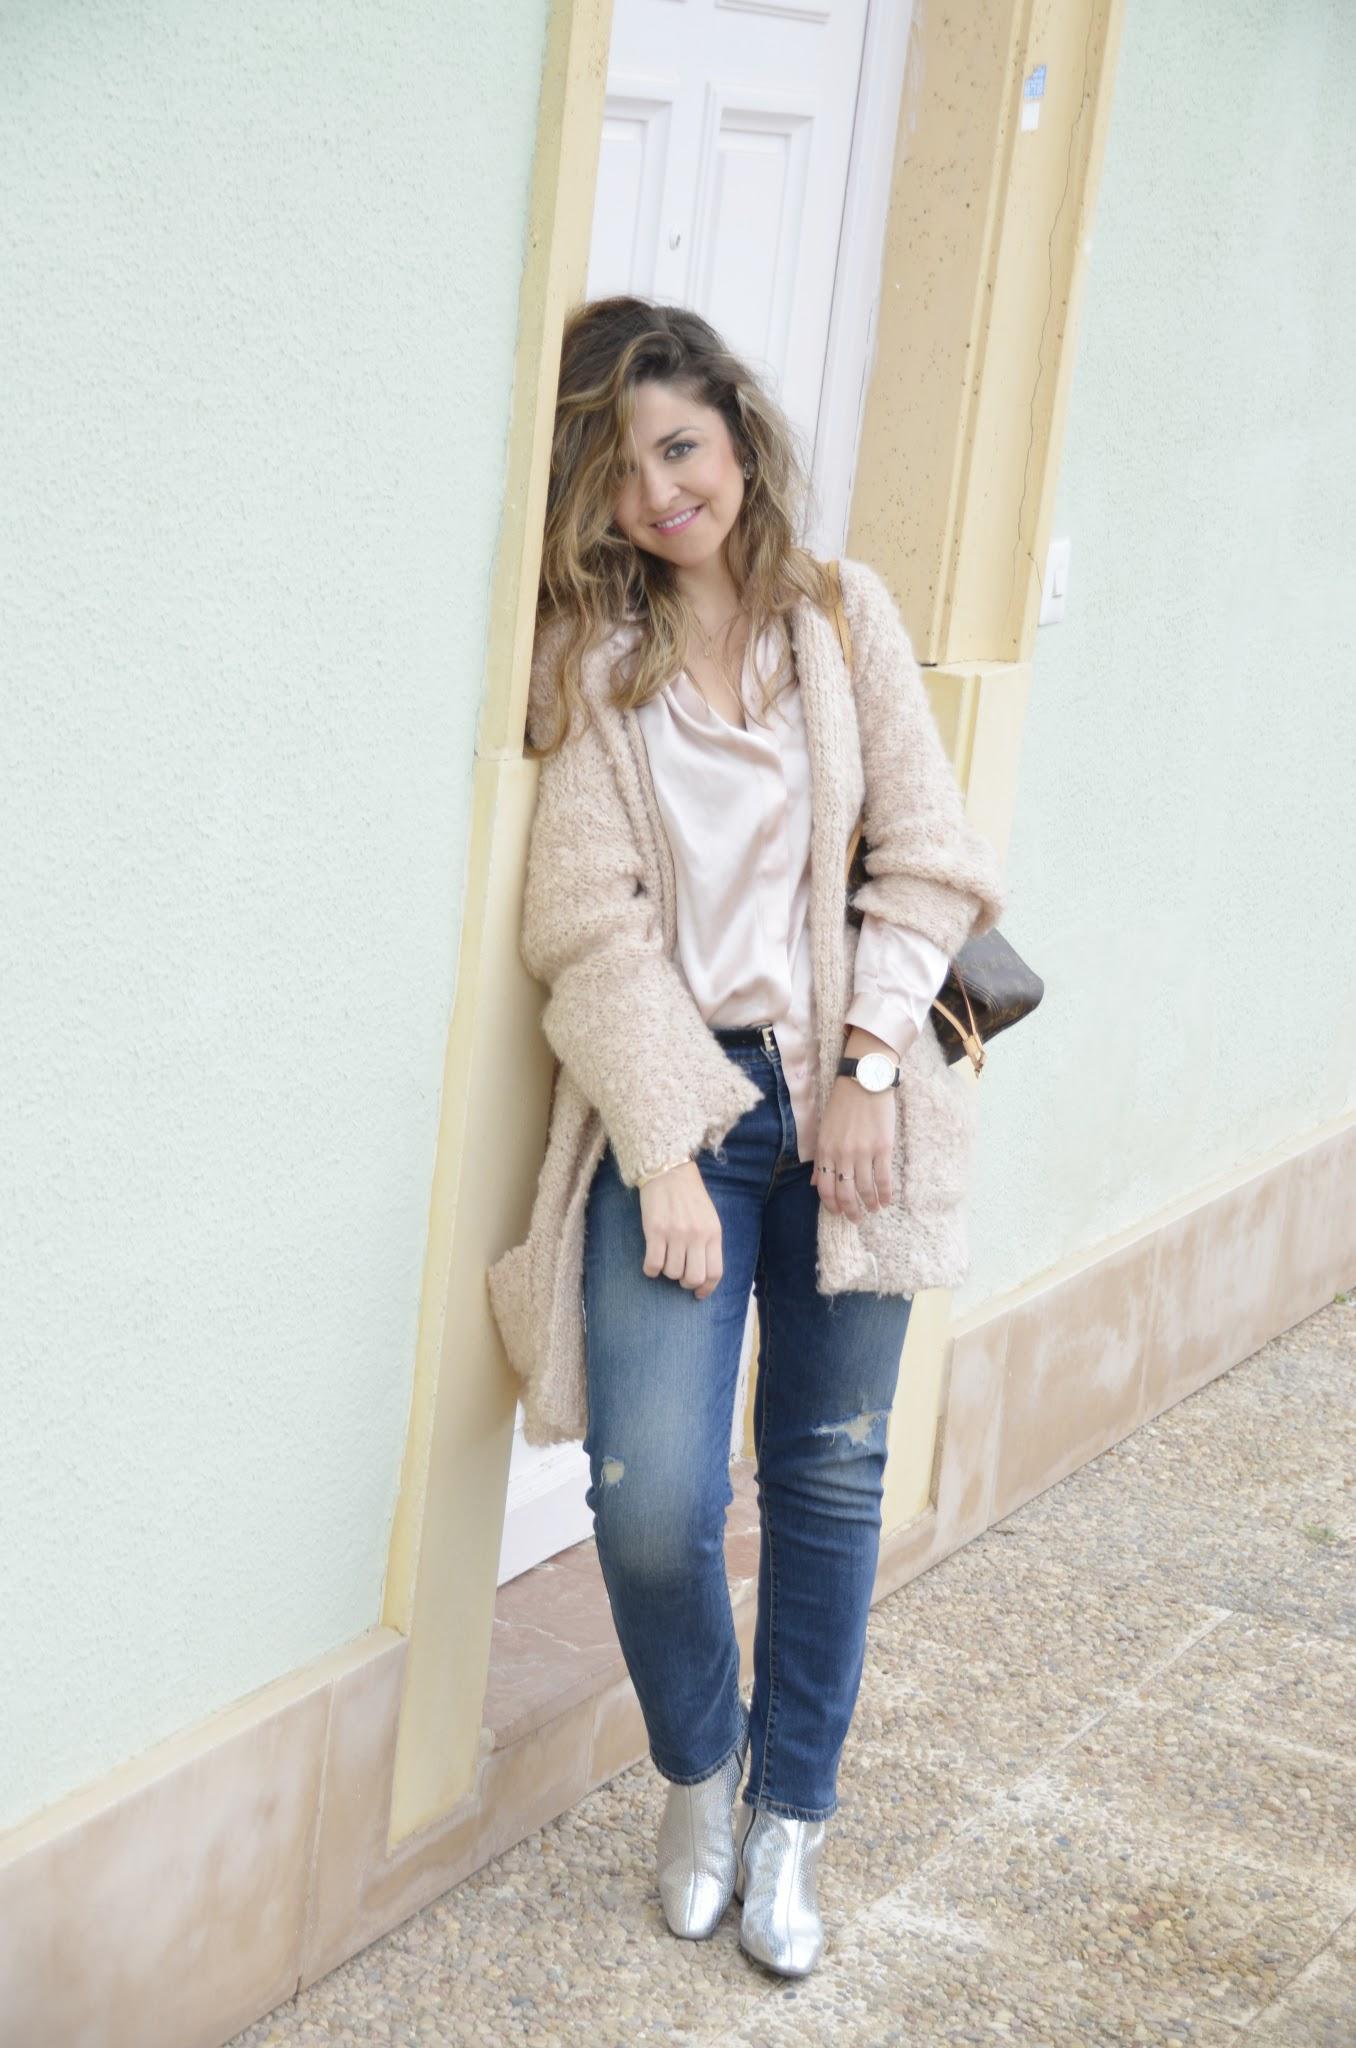 sfera cardigan silver boots levis boyfriens tarasessence fashionblogger